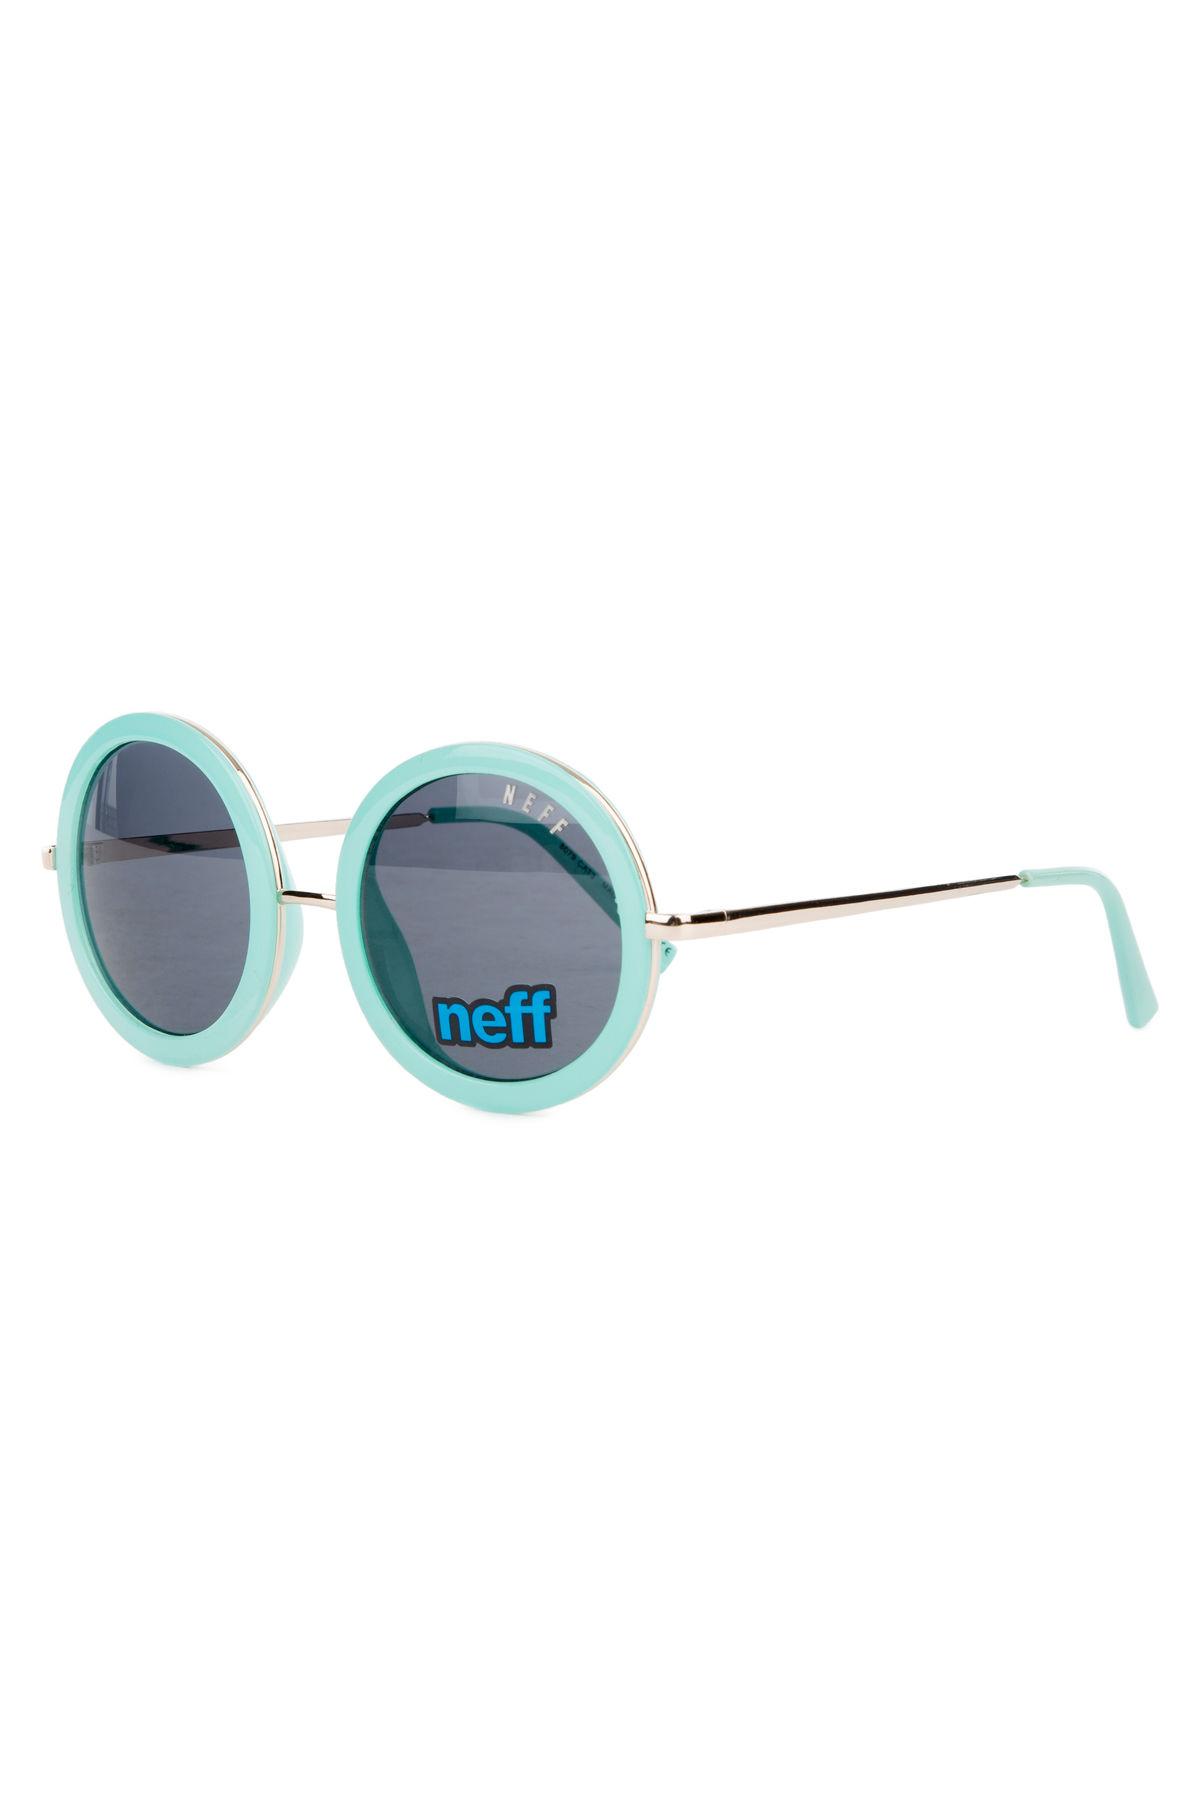 The Runaway Sunglasses in Mint